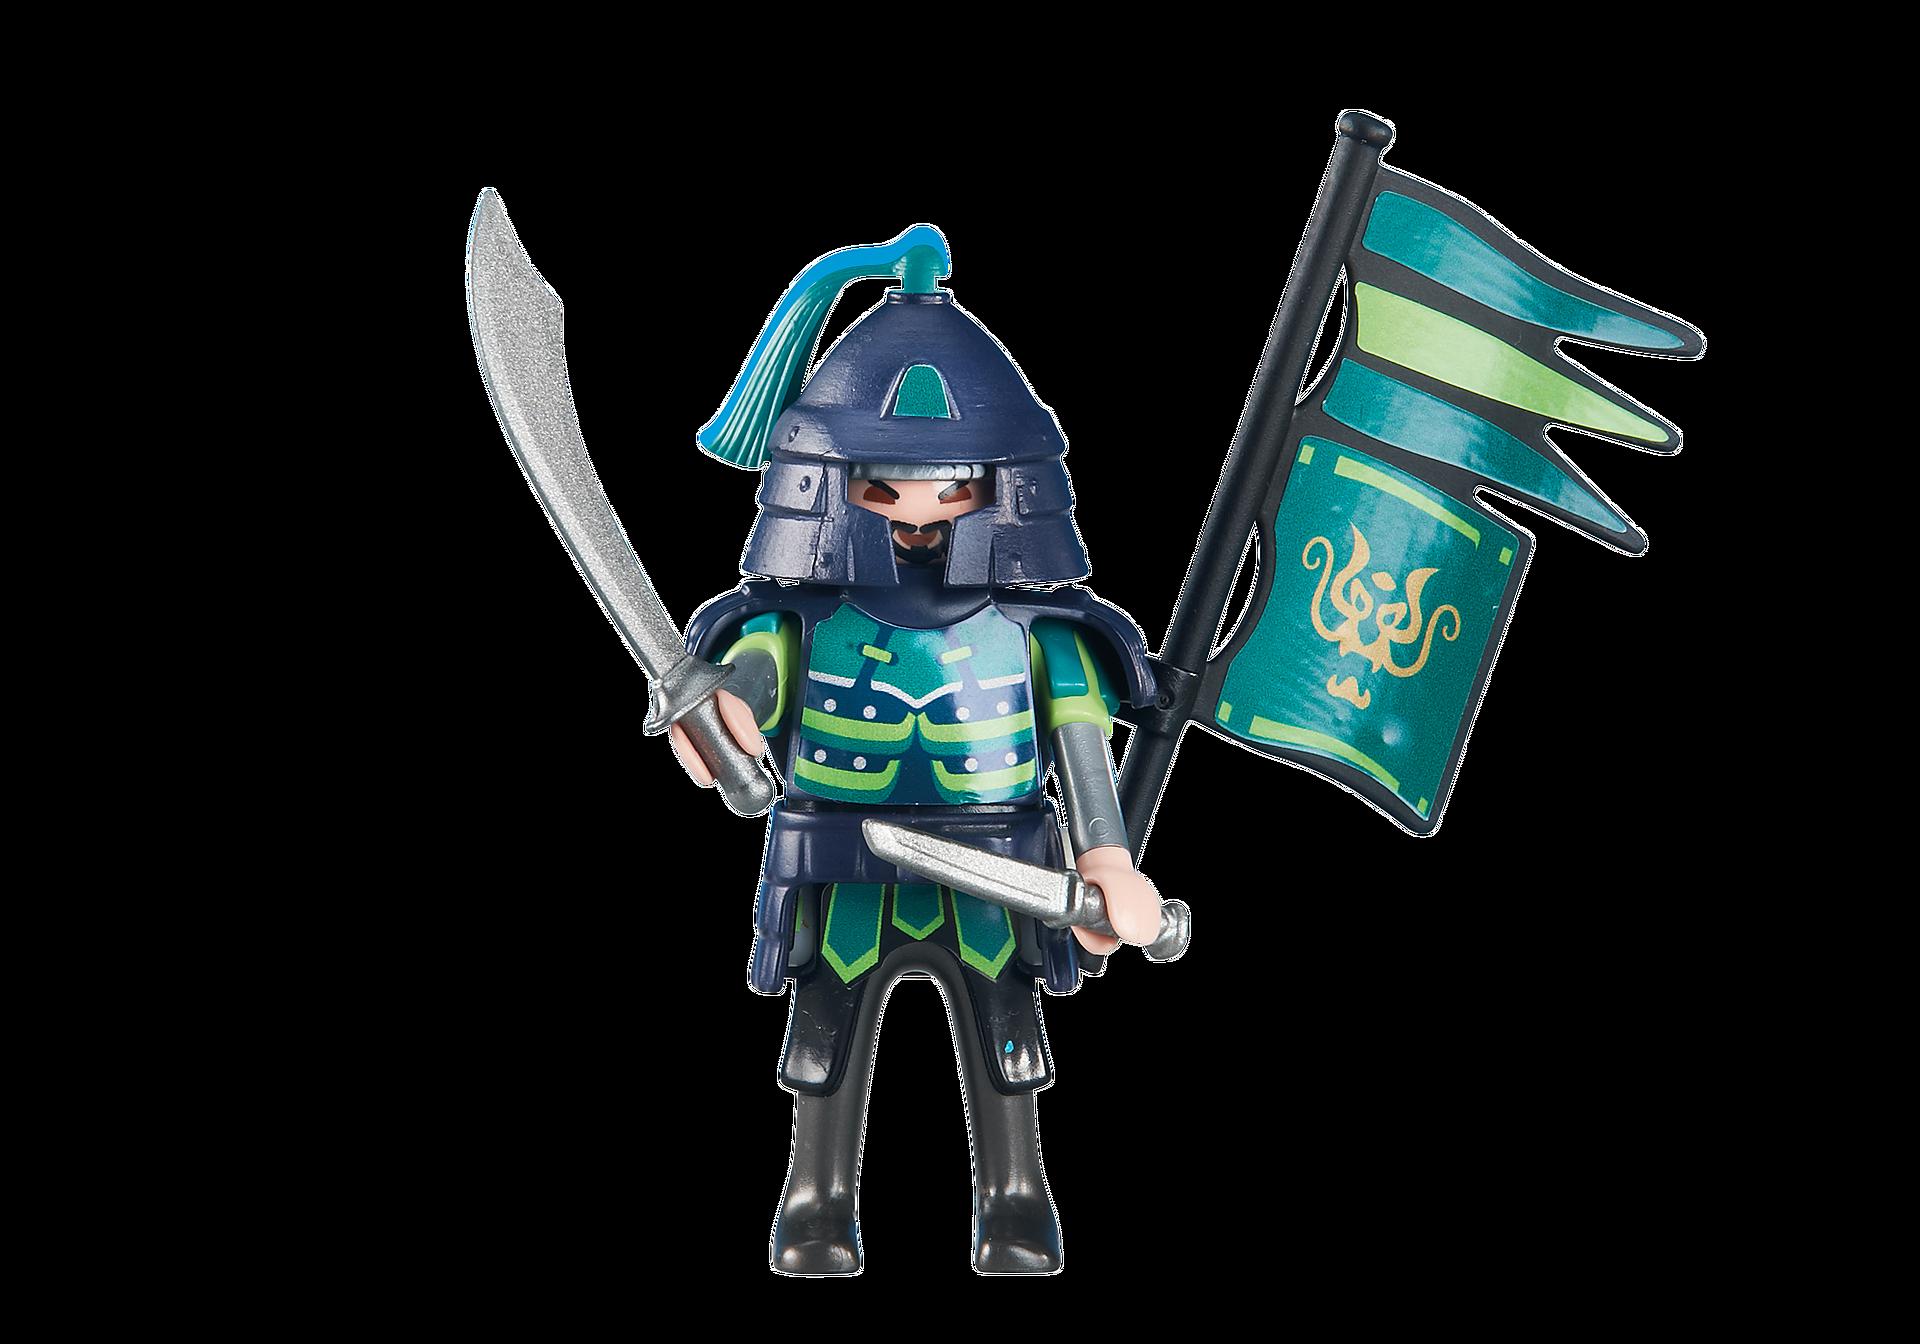 6327 Comandante dei guerrieri asiatici del Drago Verde zoom image1